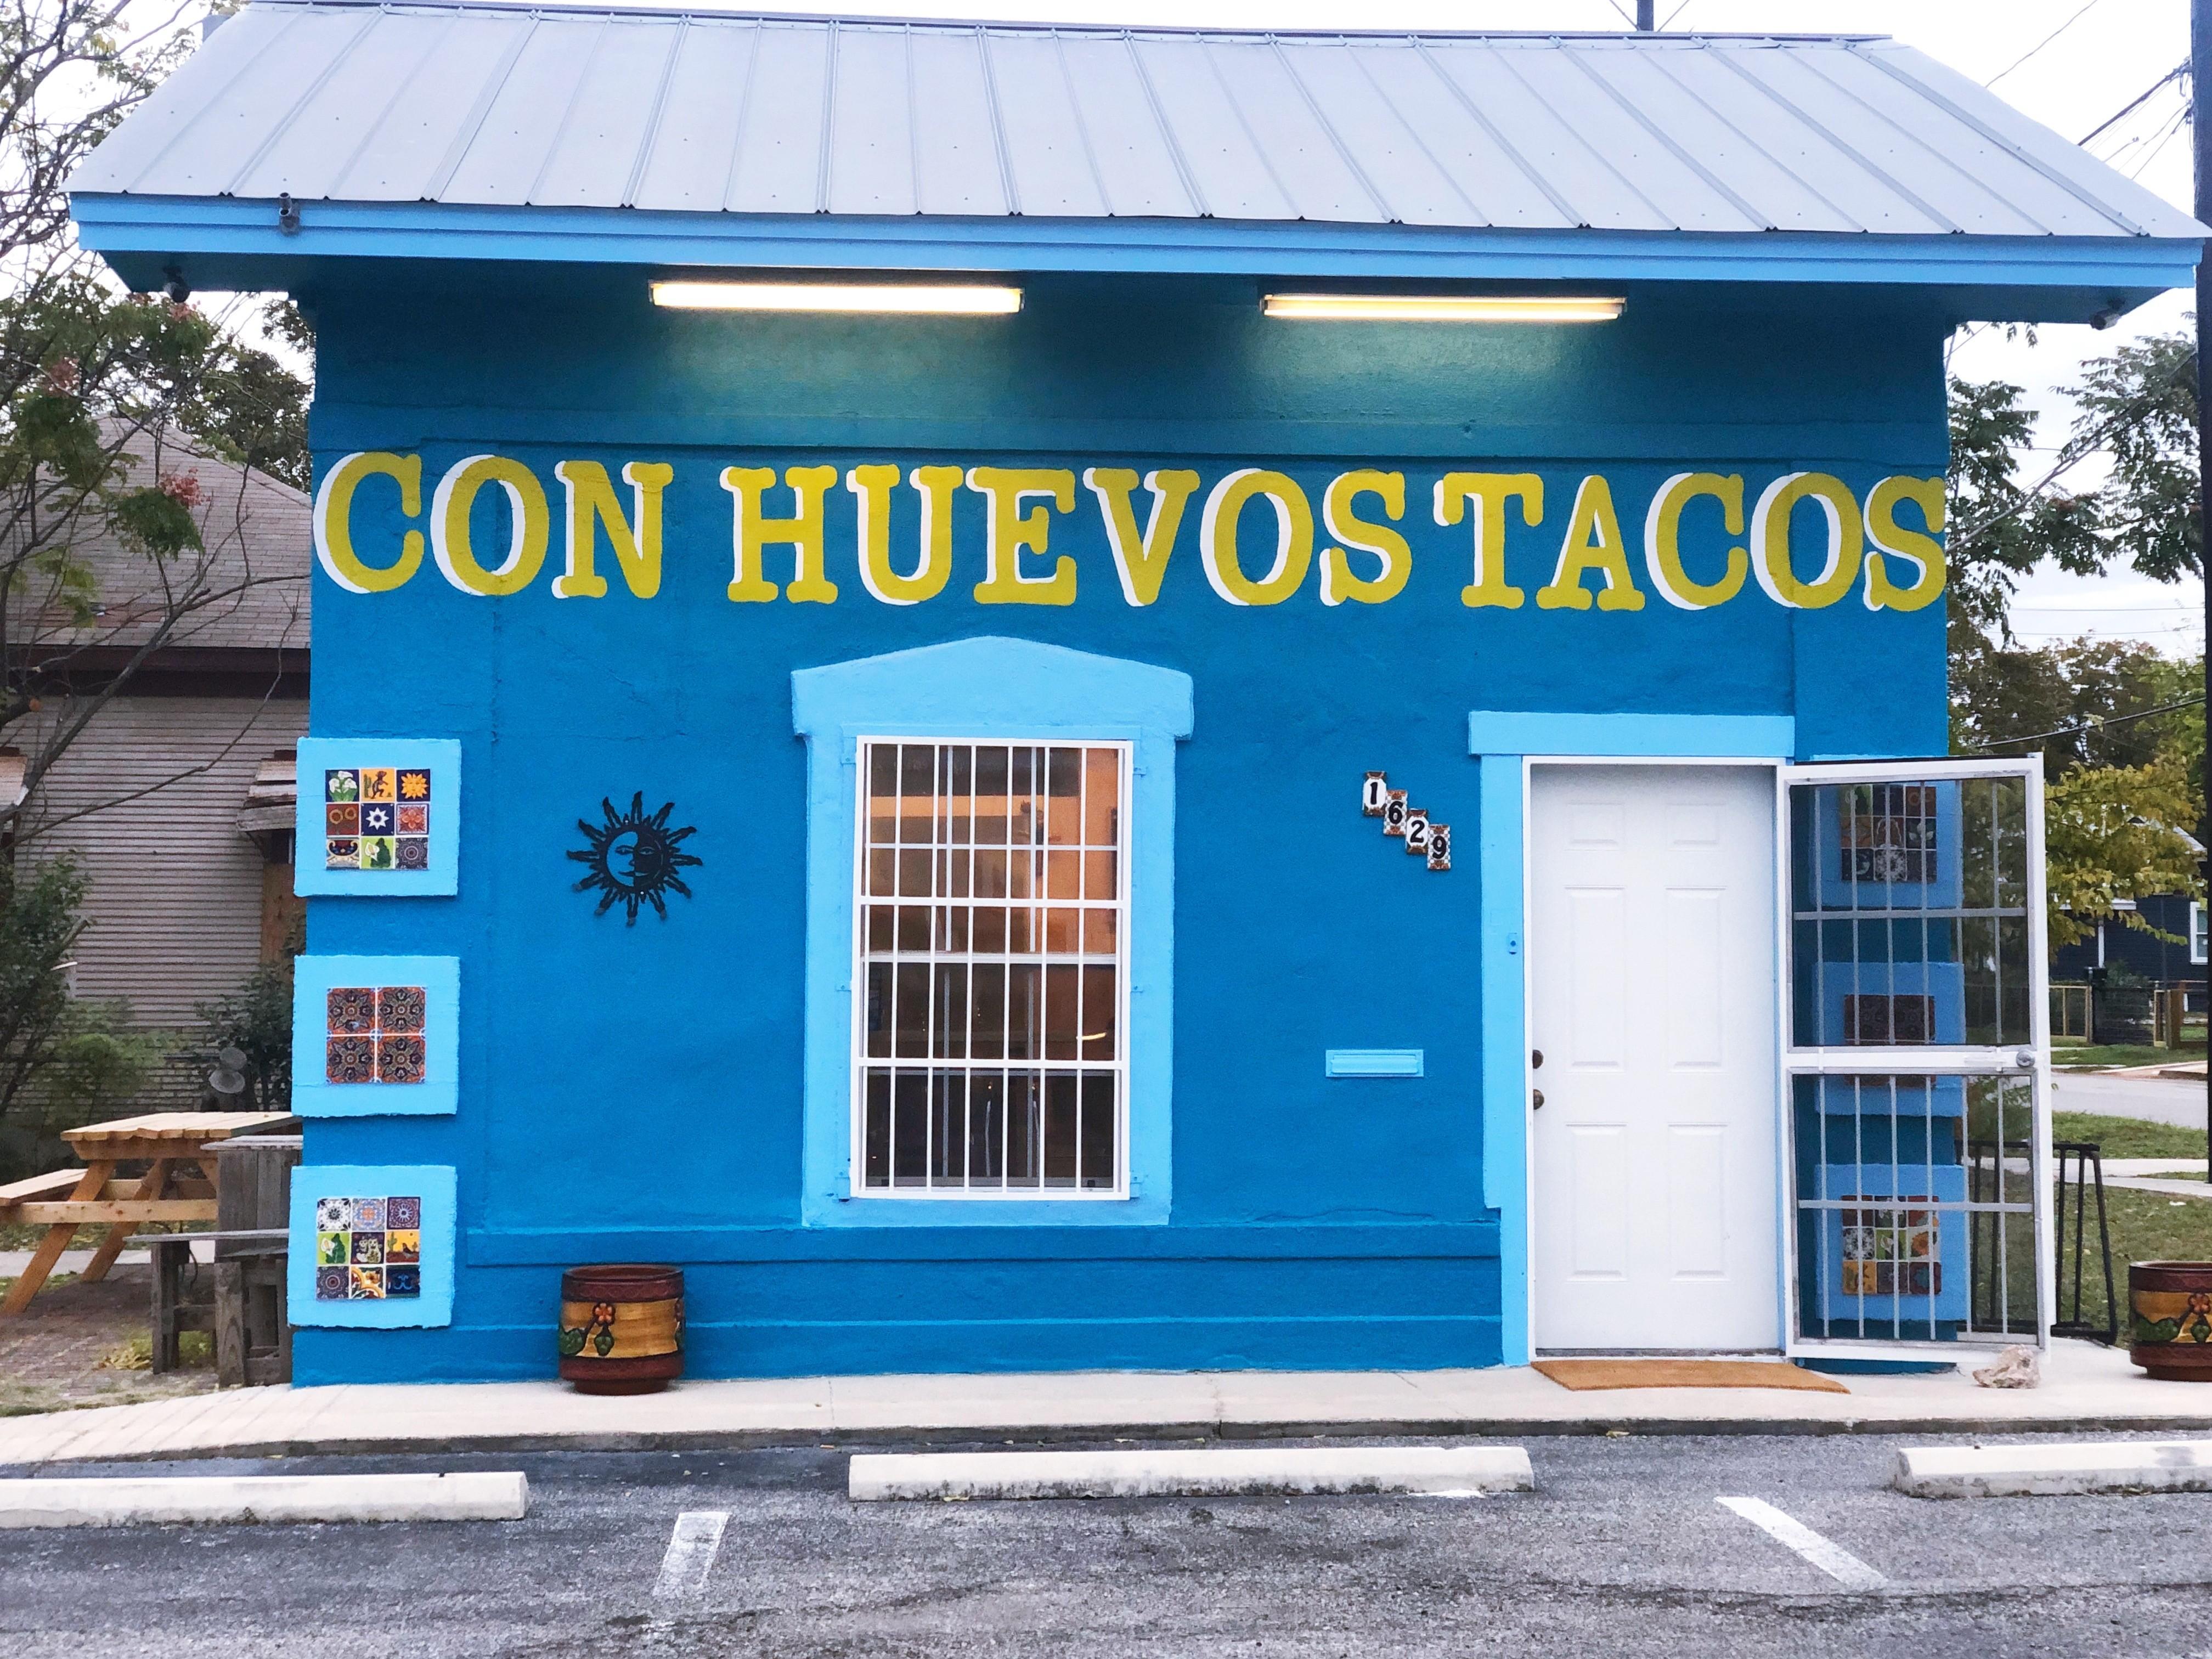 New Breakfast Taco Spot Con Huevos Opens on San Antonio's East Side